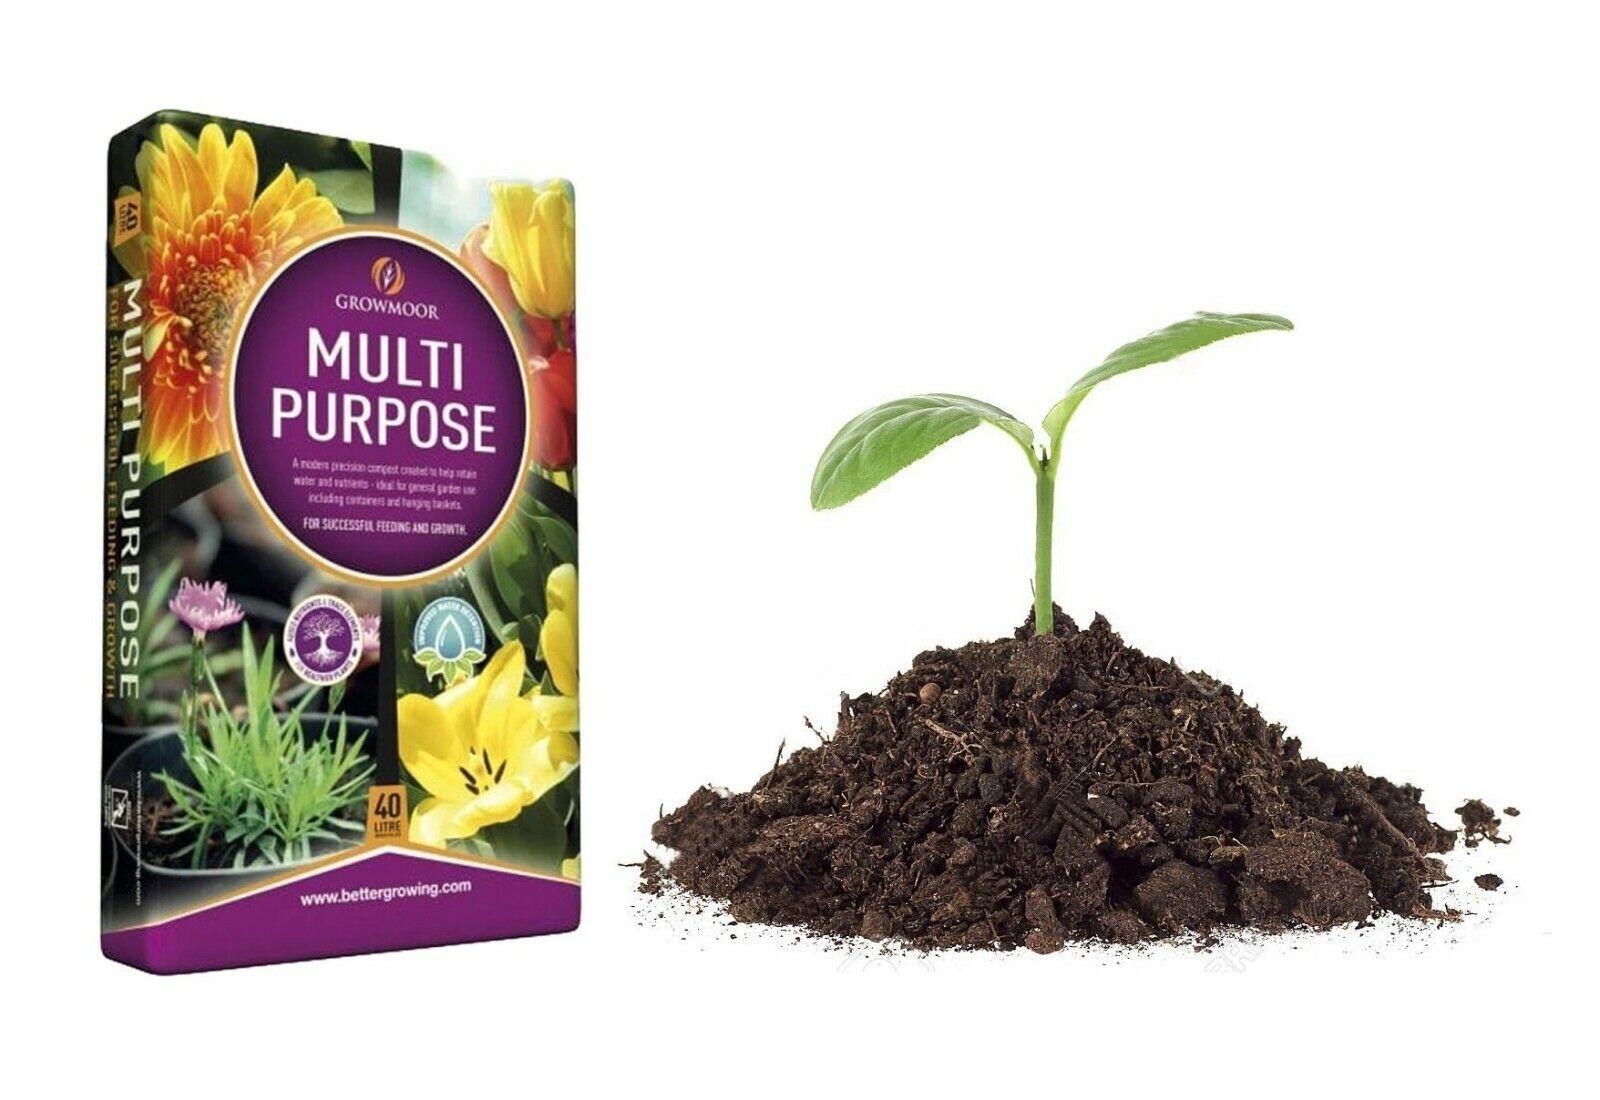 40L Growmoor Multi Purpose Plant Care Compost Soil Basket Garden Flower Pot Loam